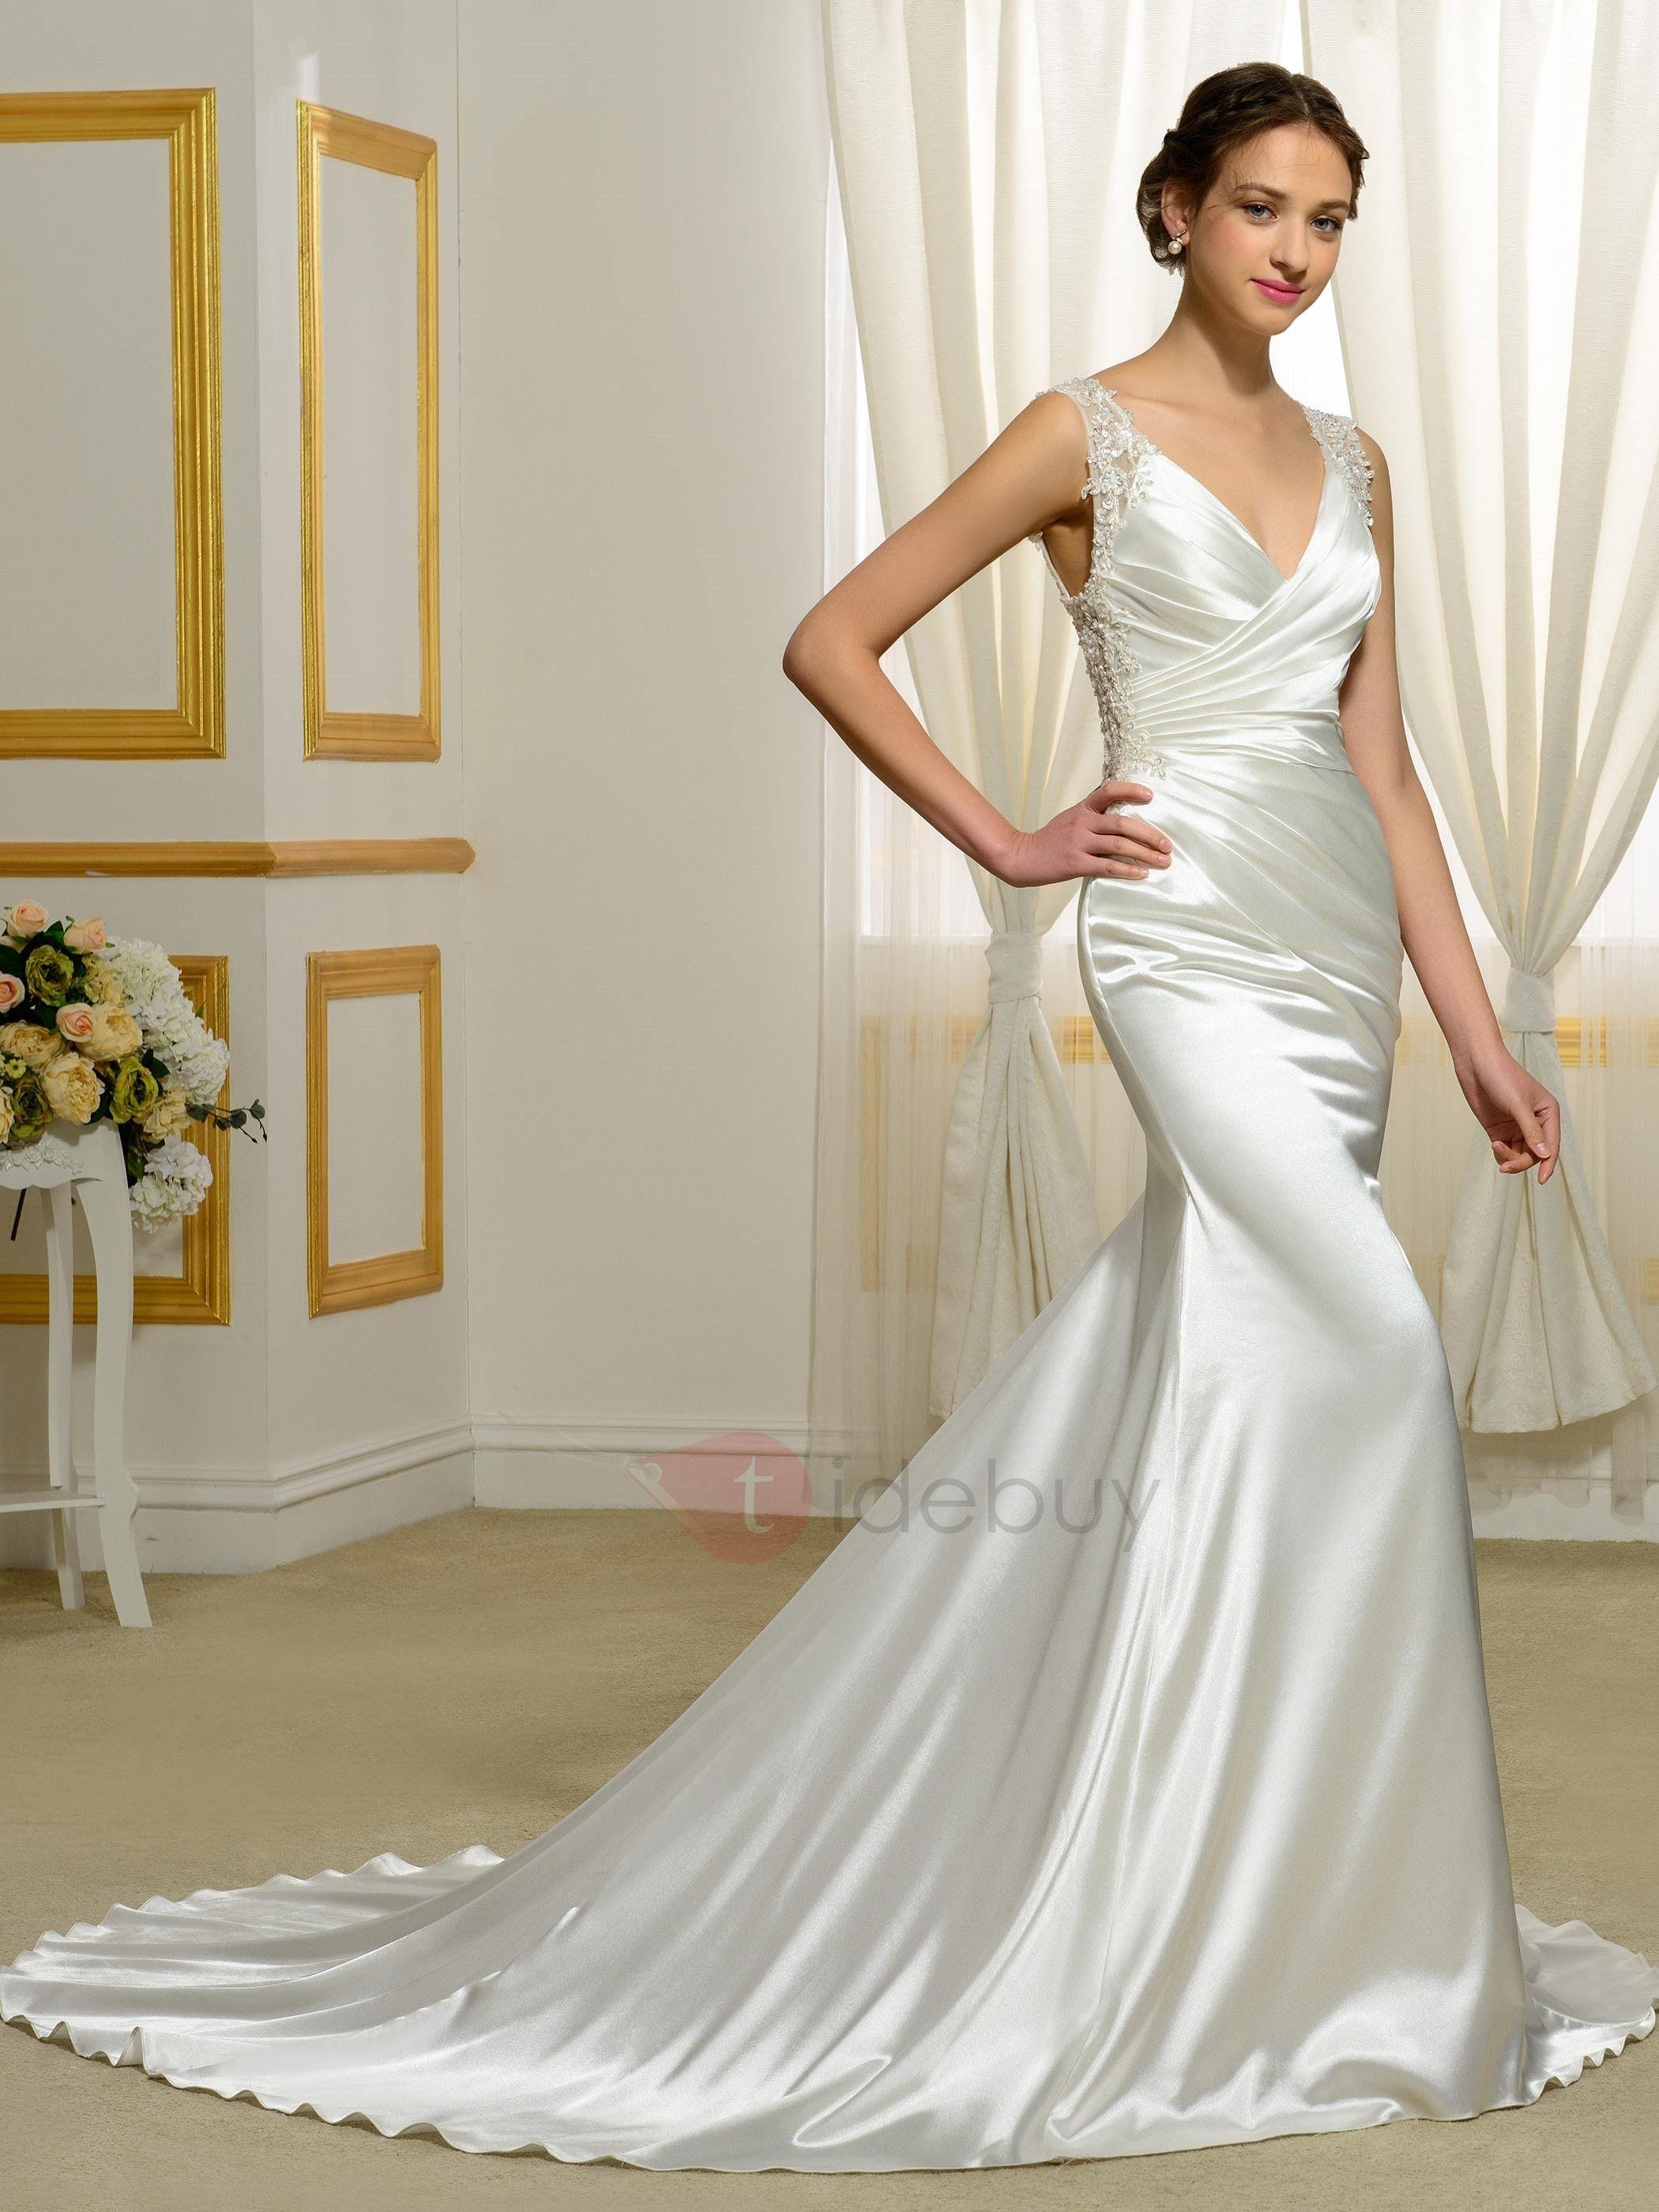 Tidebuy Offers High Quality V Neck Backless Mermaid Wedding Dress We Have More